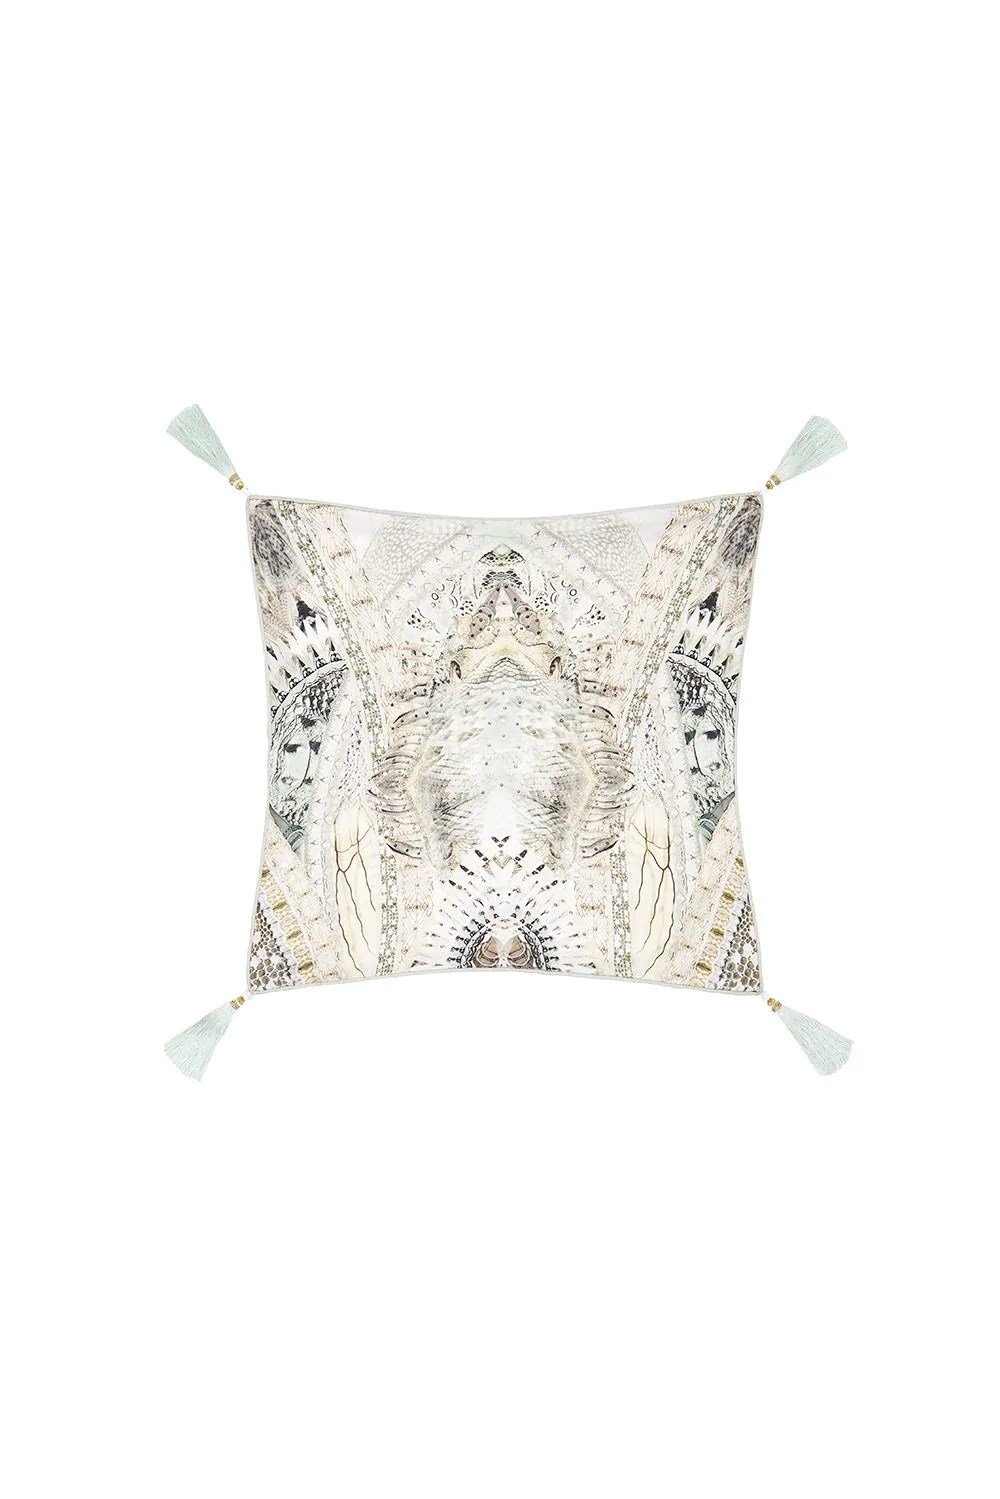 camilla daintree dreaming small square cushion zambezee